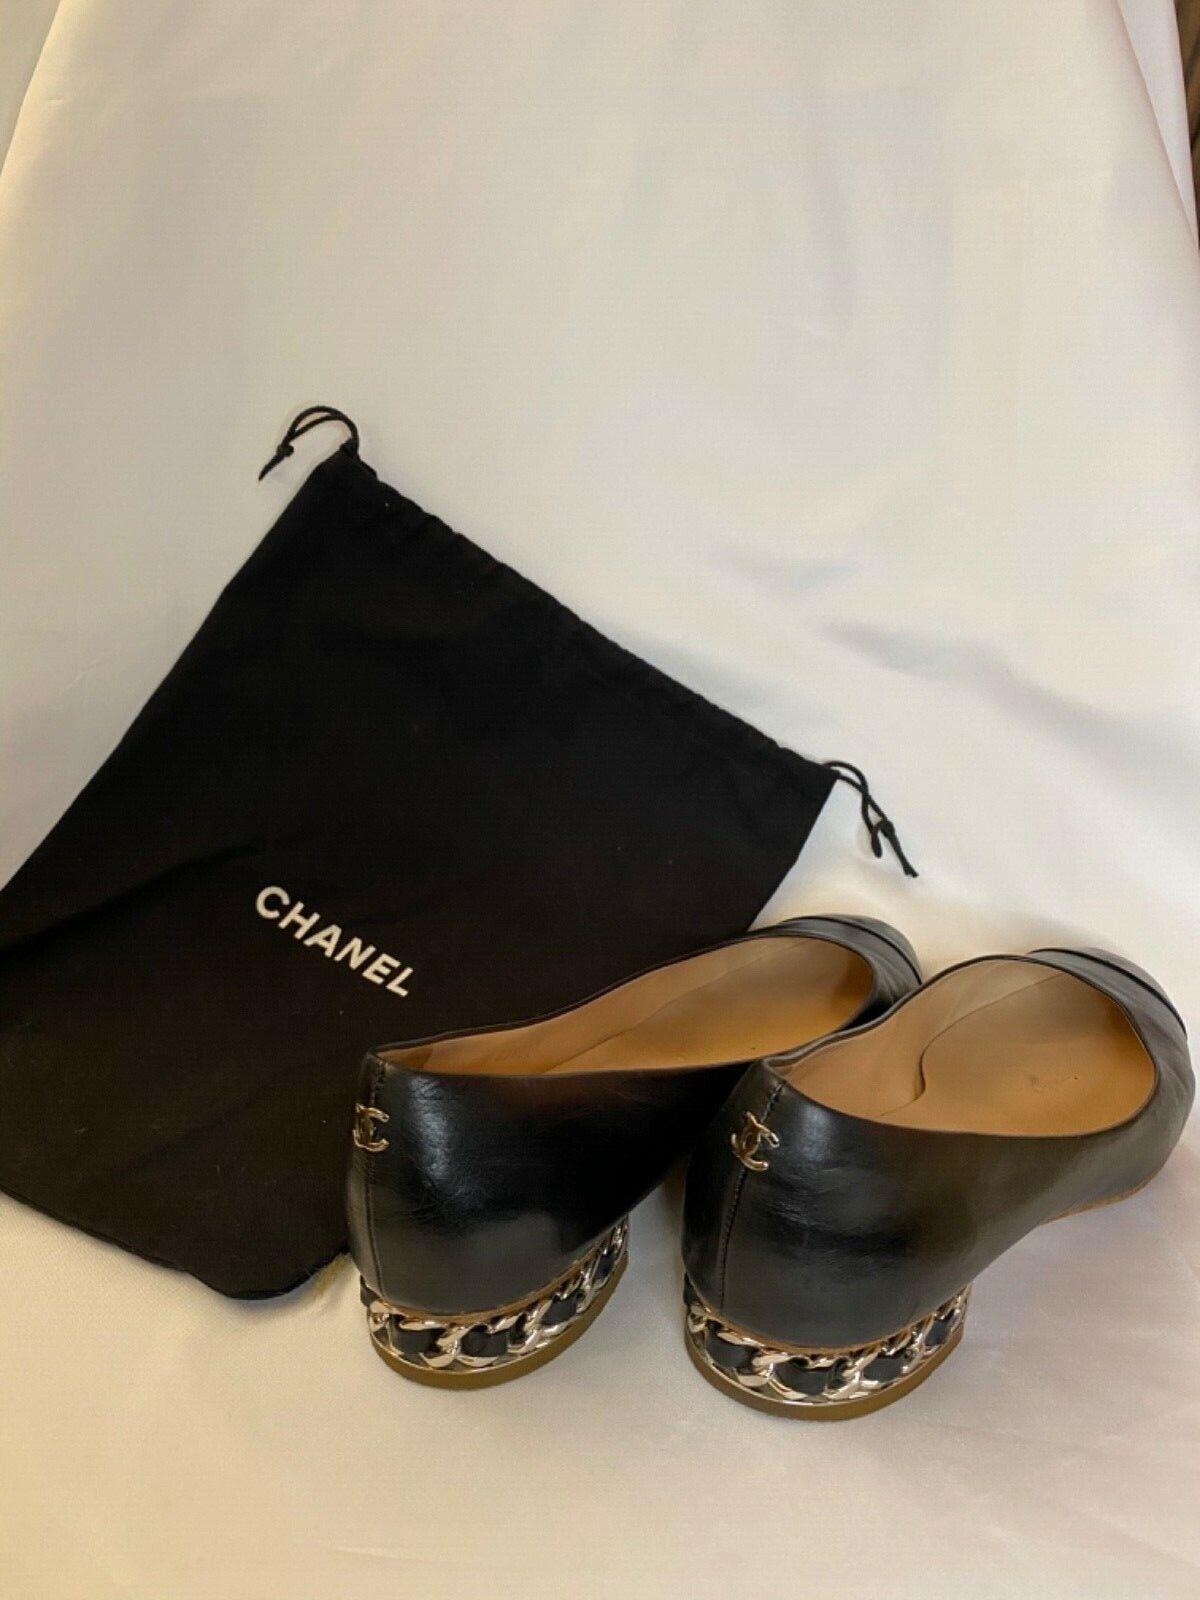 chanel flats online